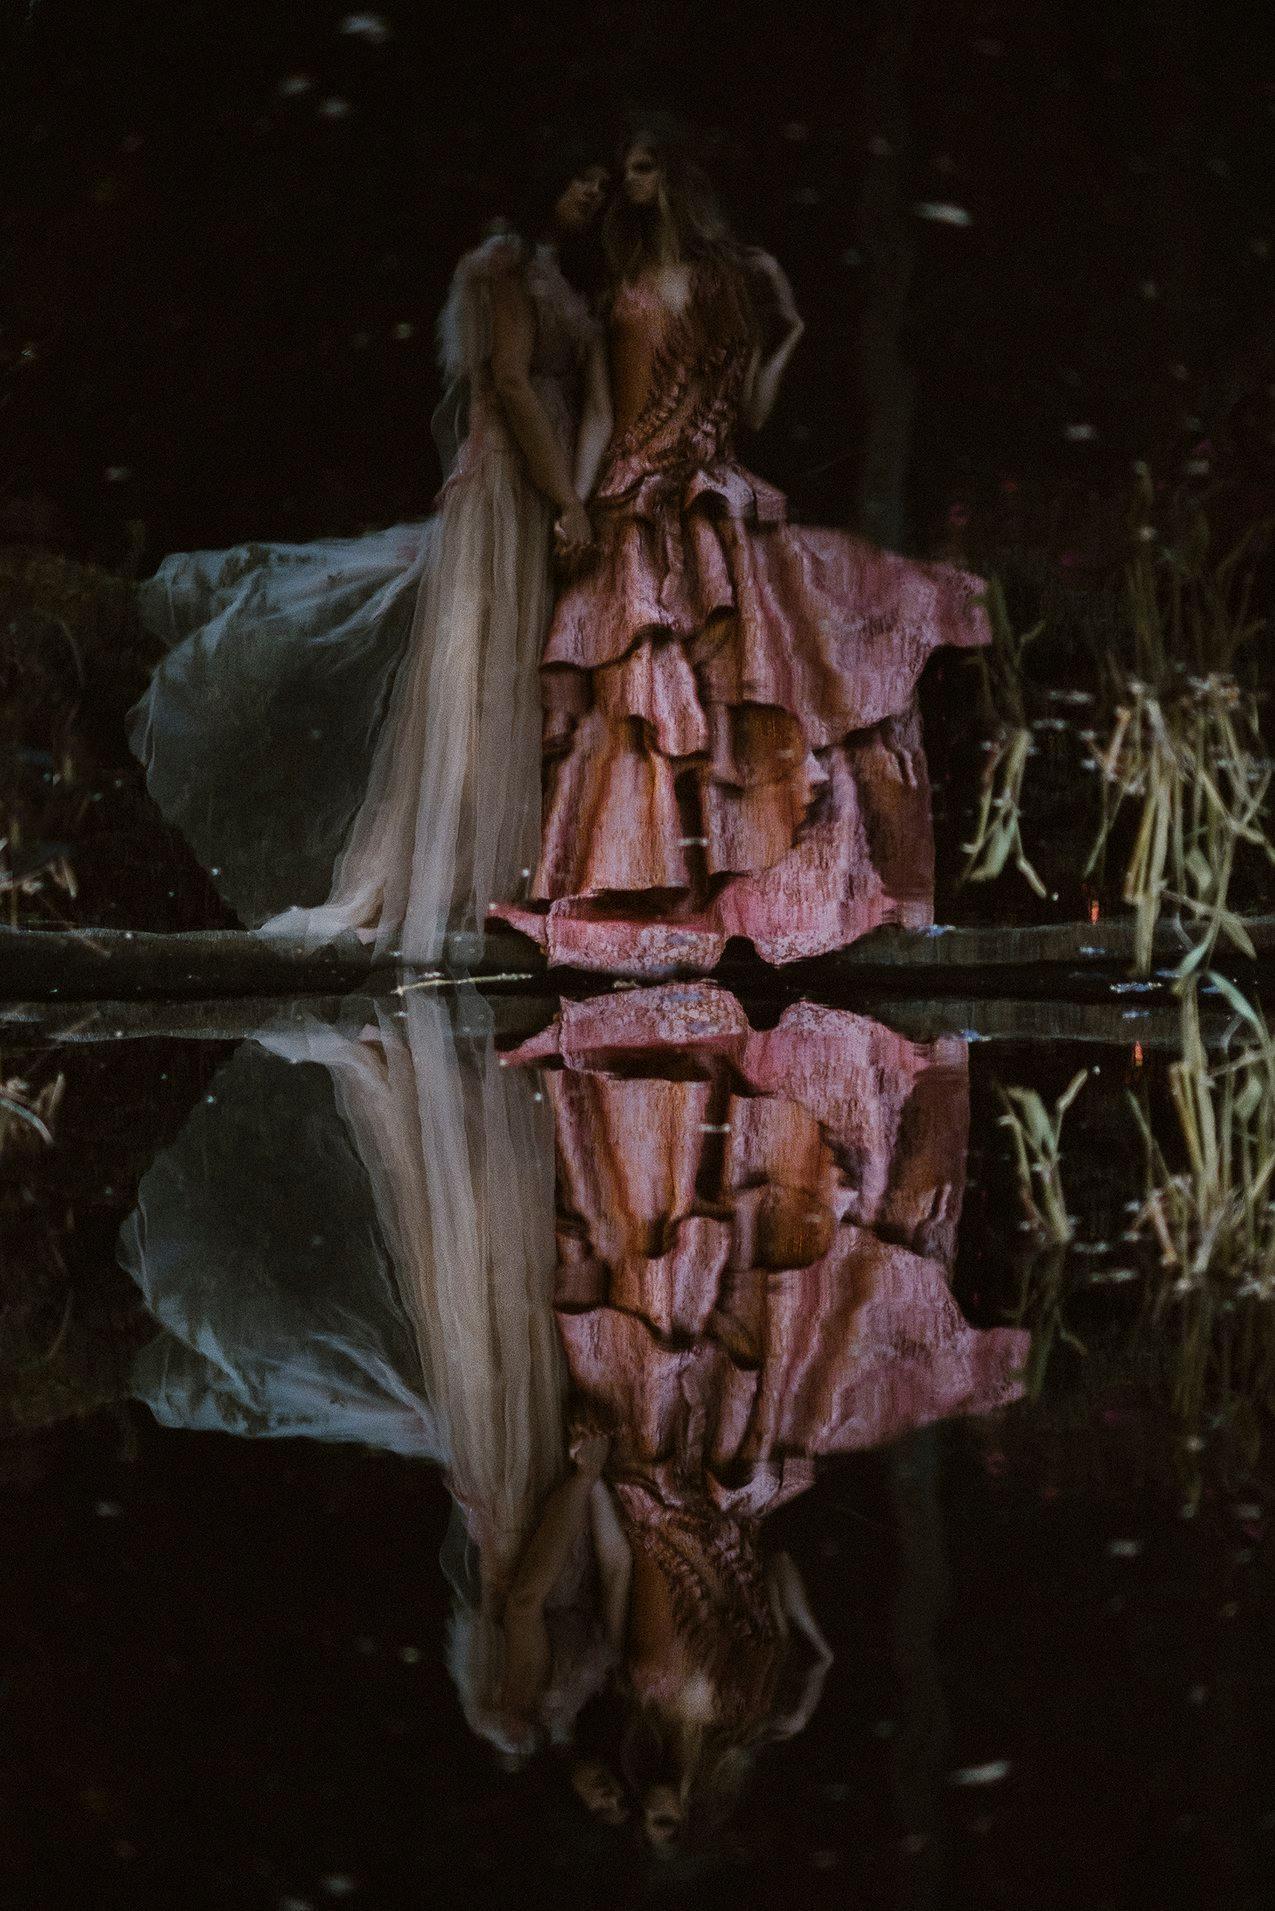 dawndra budd - Emotional Storytelling with Twyla Jones - Wildest Dreams.jpg